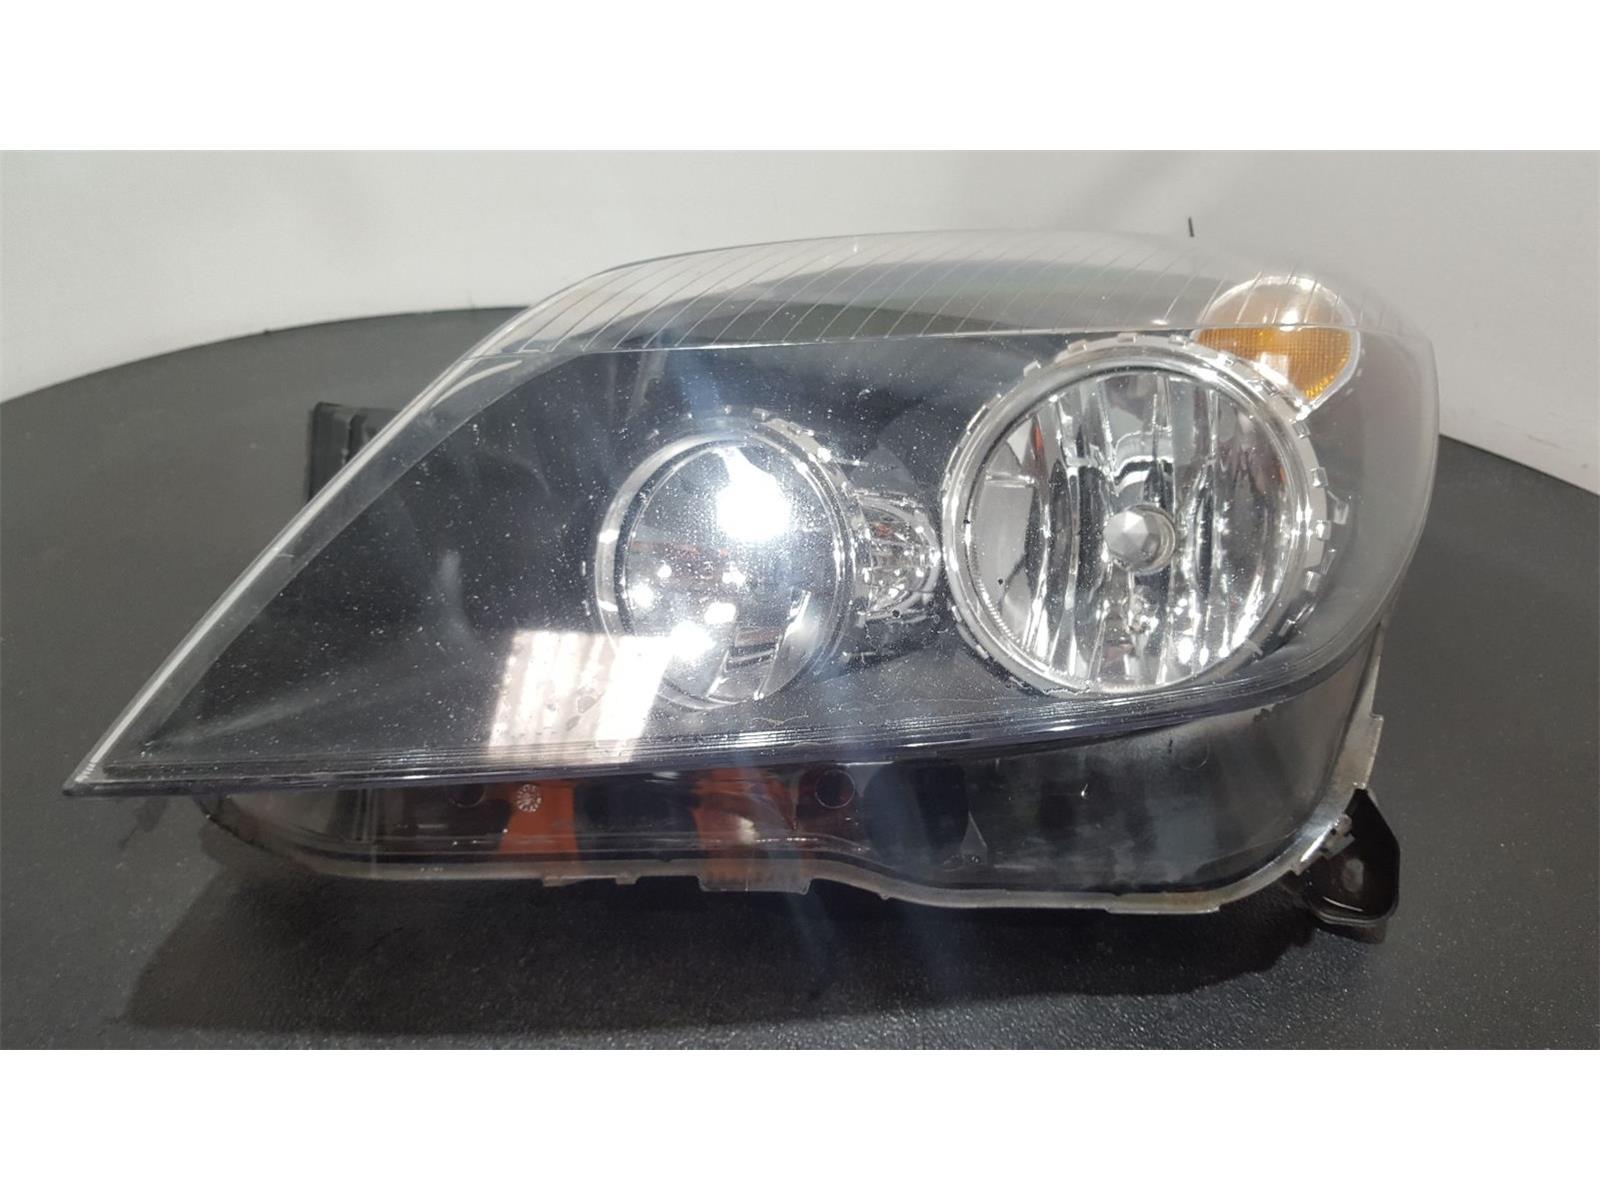 Vauxhall Astra 2004 To 2006  N/S Left Passengers Headlamp Headlight 1LG270370-03